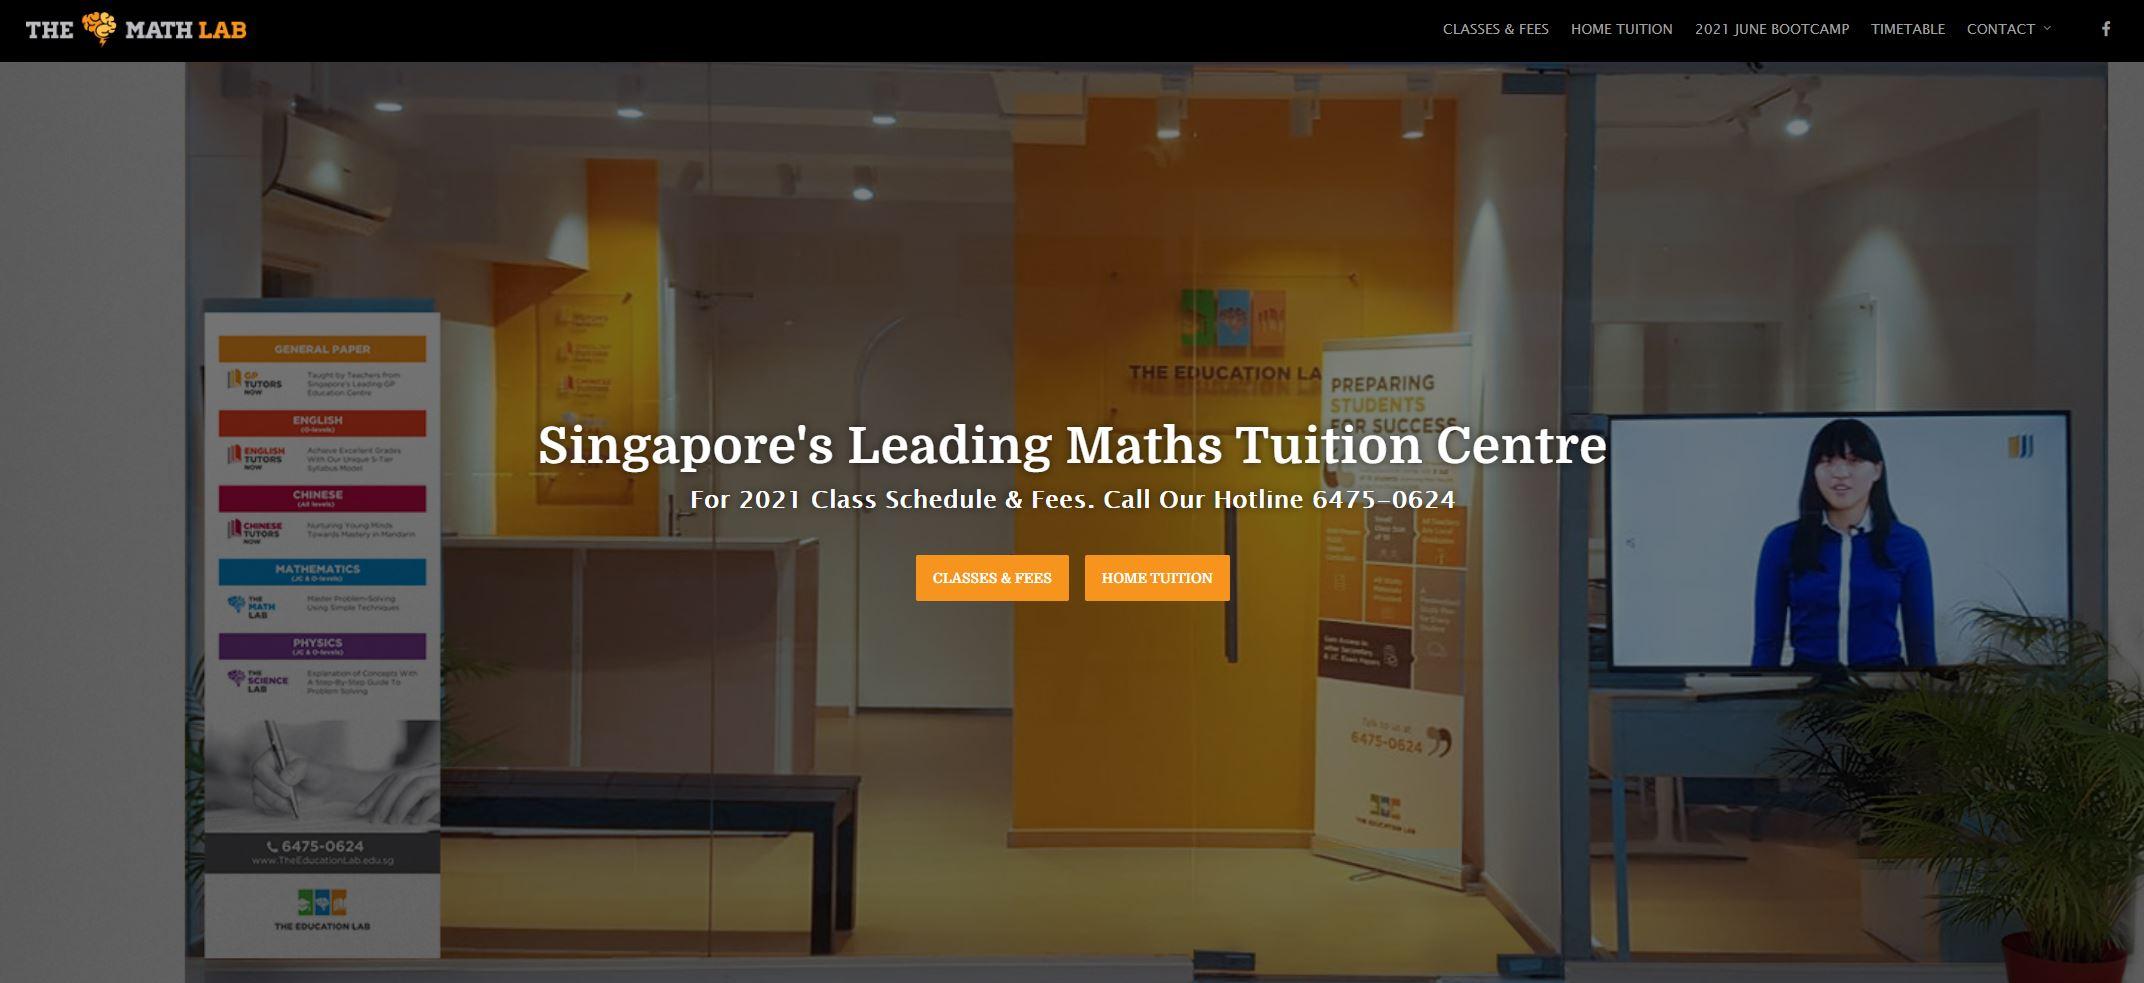 The Math Lab JC Tuition